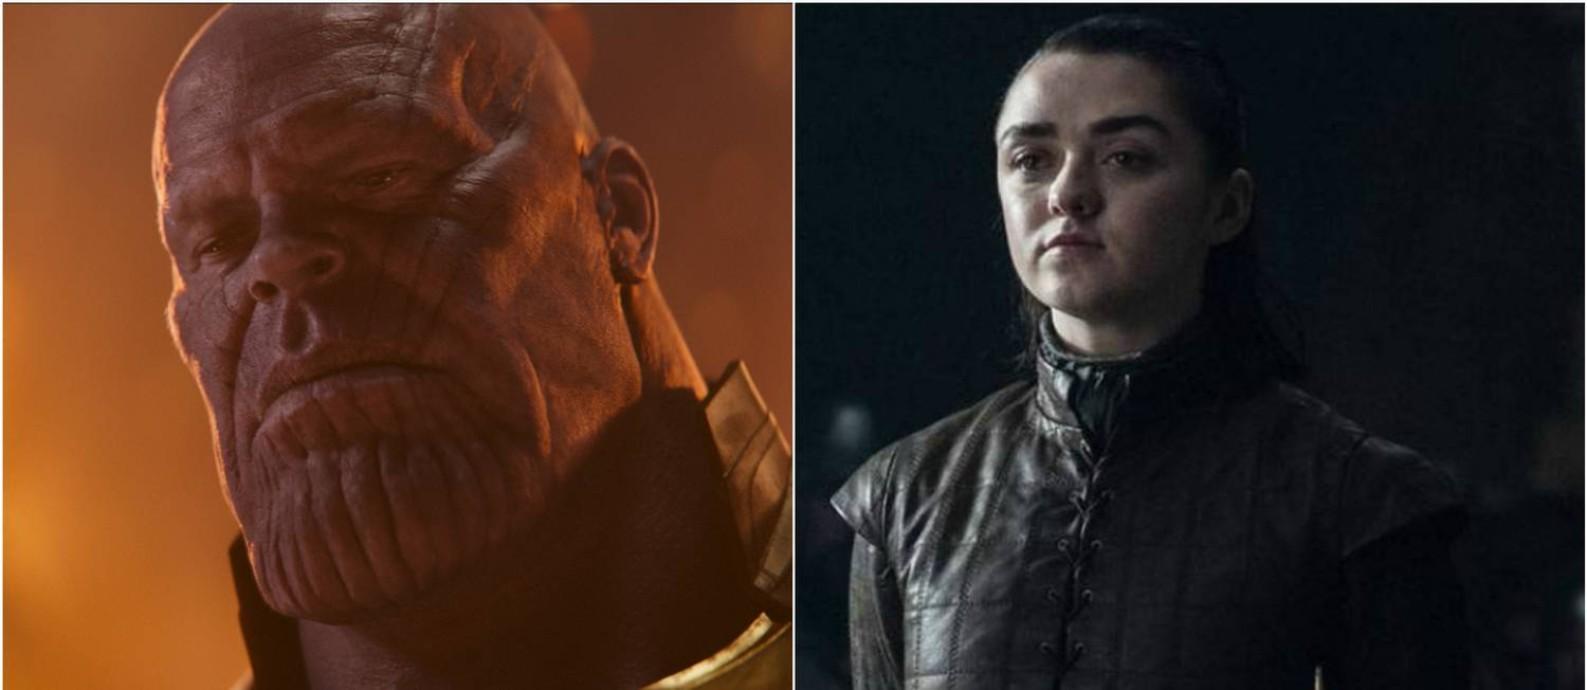 Thanos perdeu a batalha da popularidade no Twitter para Arya Stark Foto: Thanos (AP) Arya (HBO)